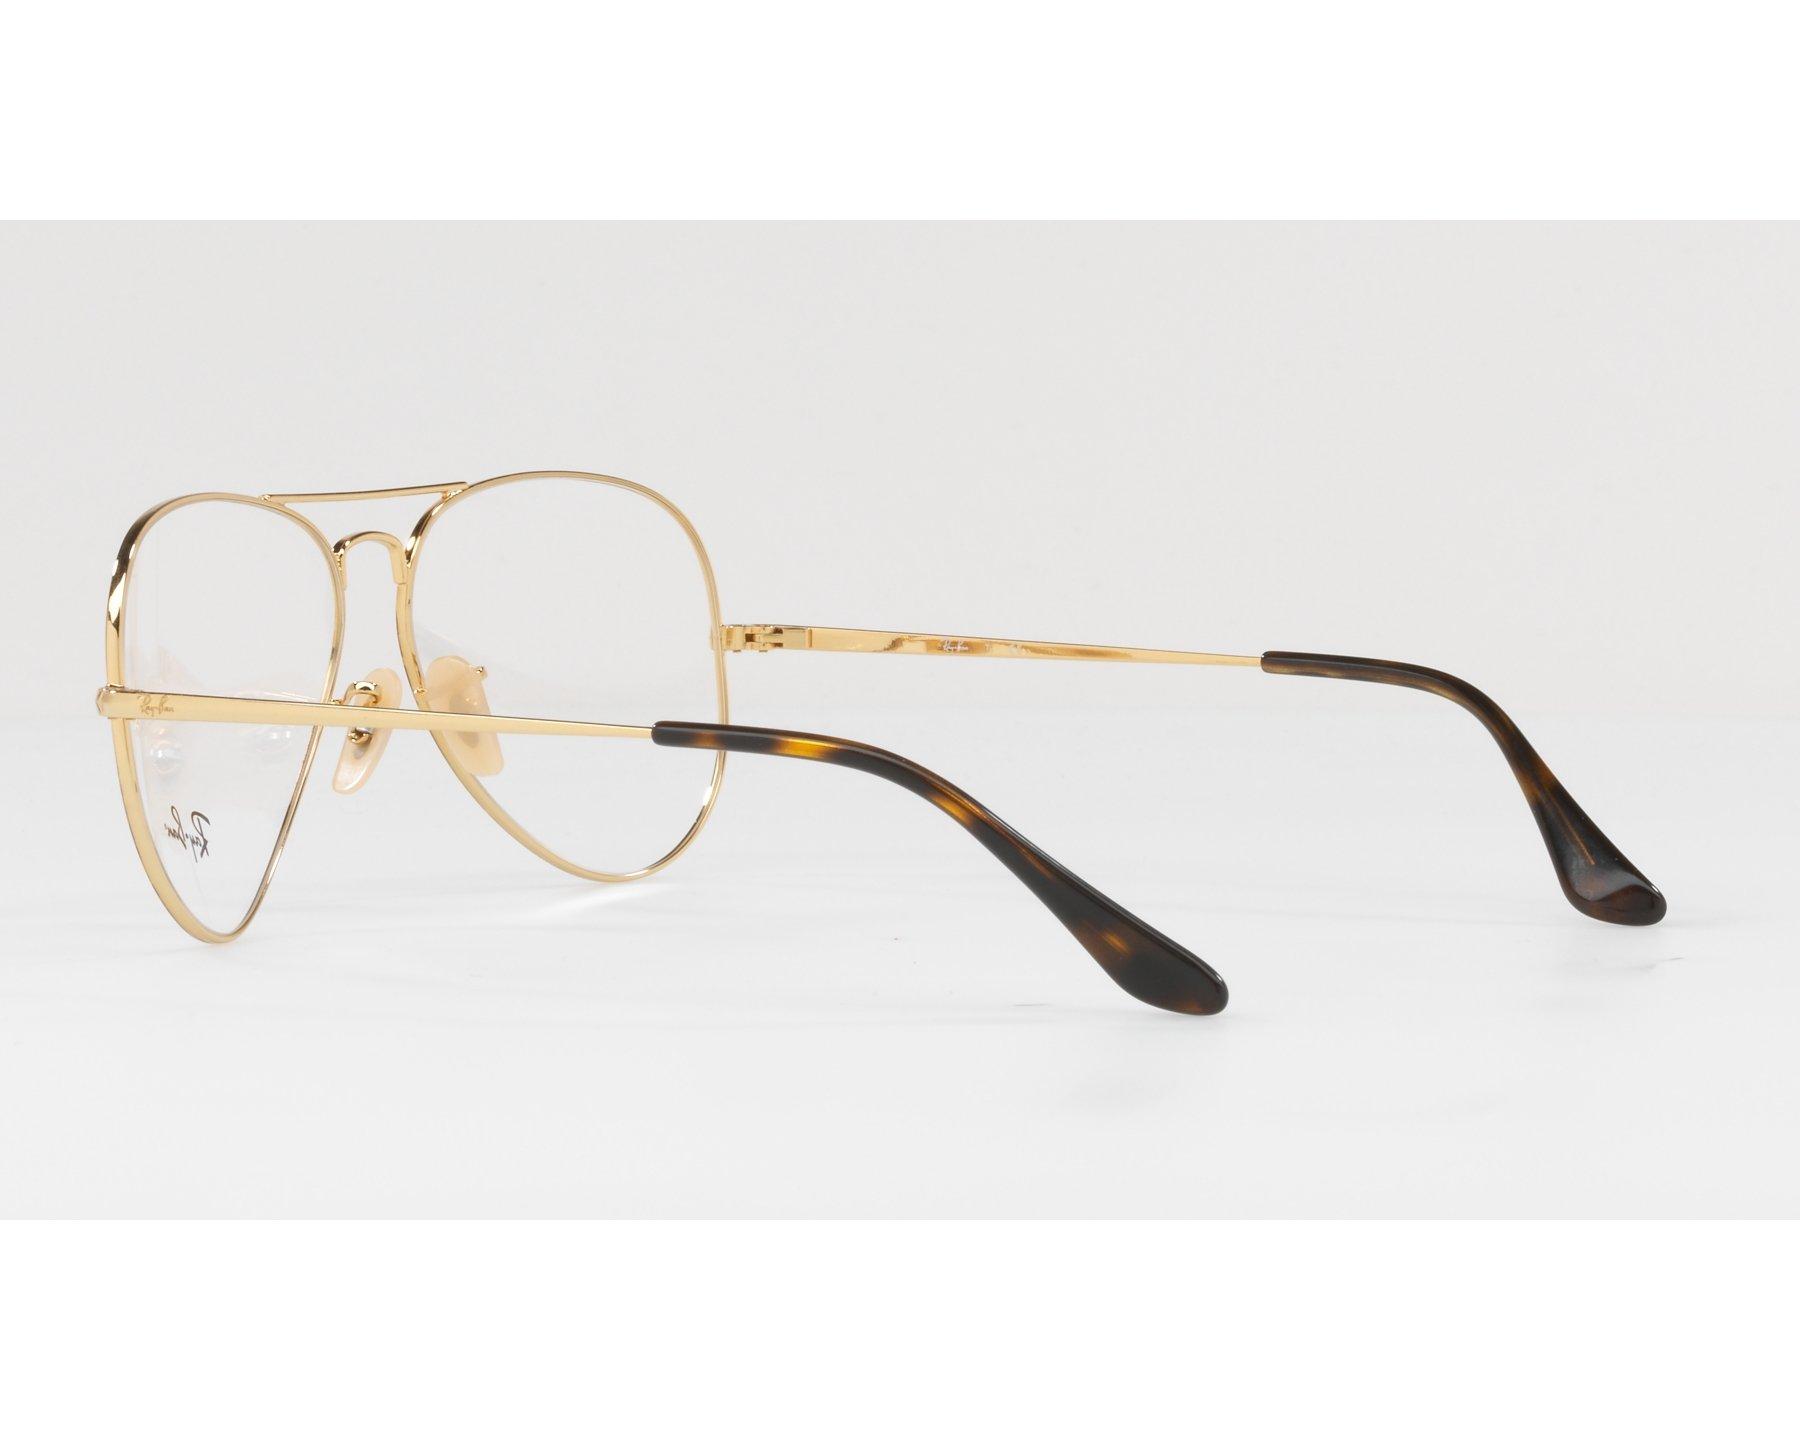 028bb3f60c Gafas Graduadas Ray-Ban RX-6489 2945 55-14 Havana Oro Vista de